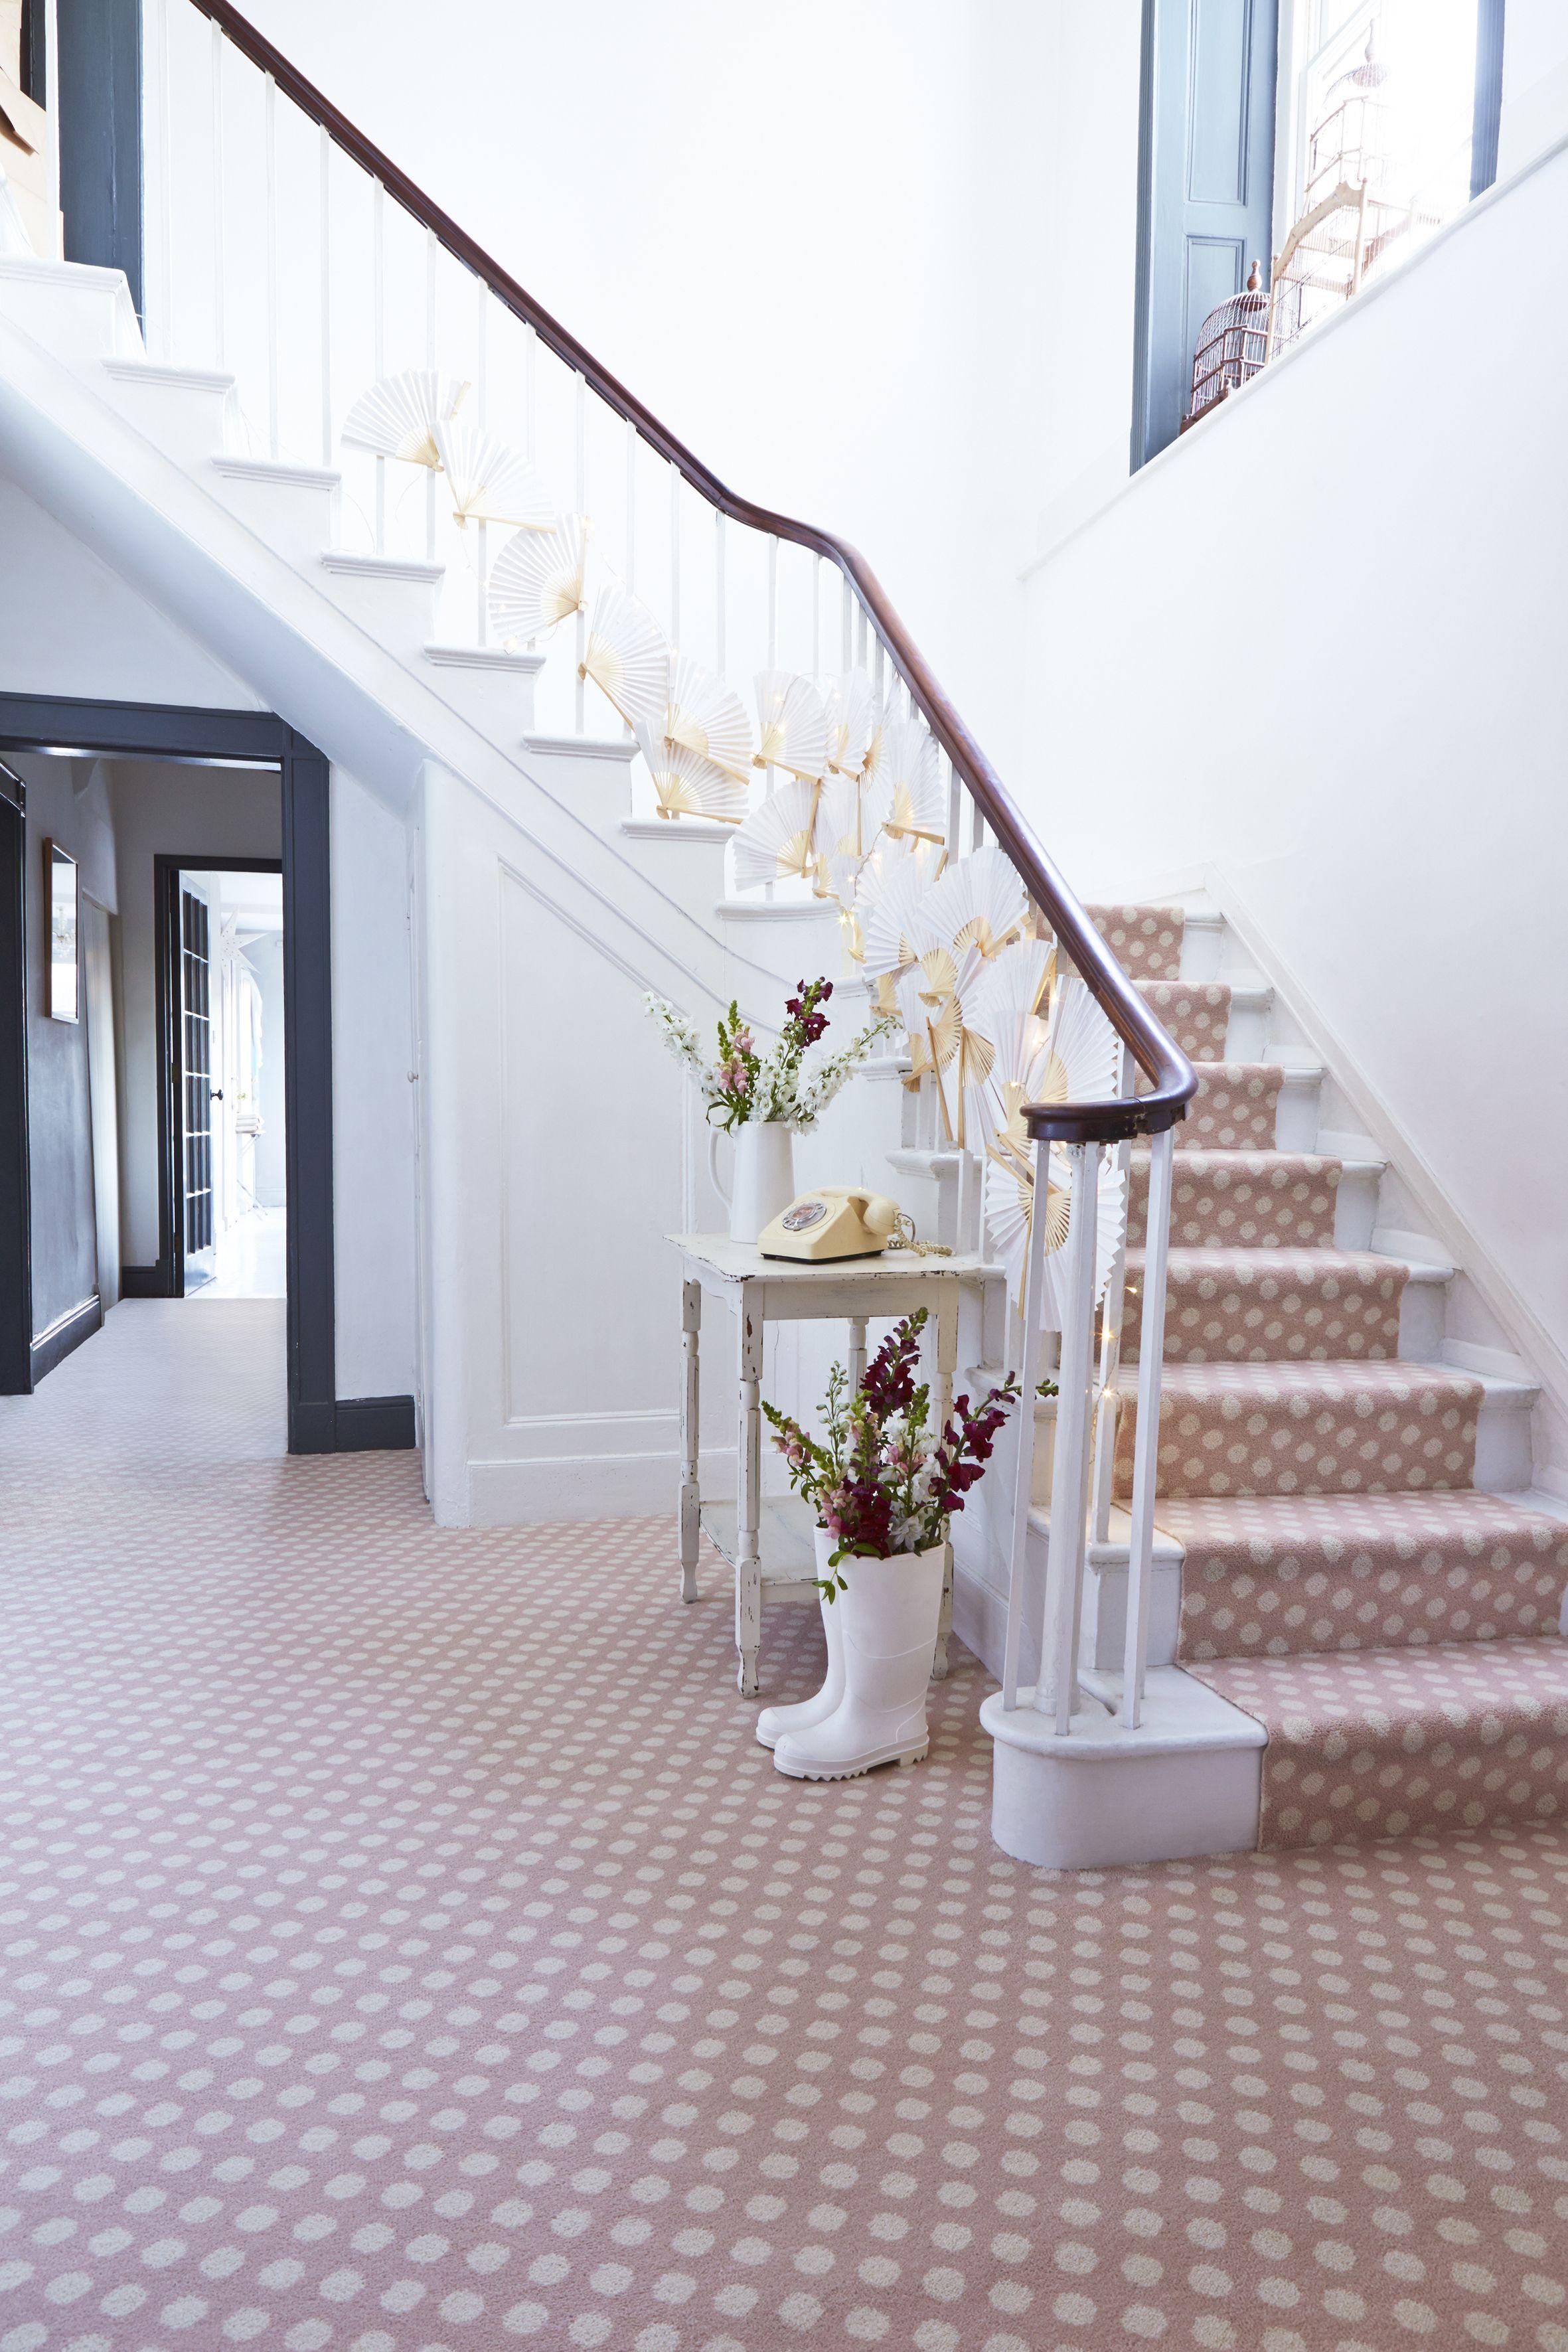 Inspiration for carpets tc matthews carpets interiors inspiration for carpets tc matthews carpets baanklon Gallery